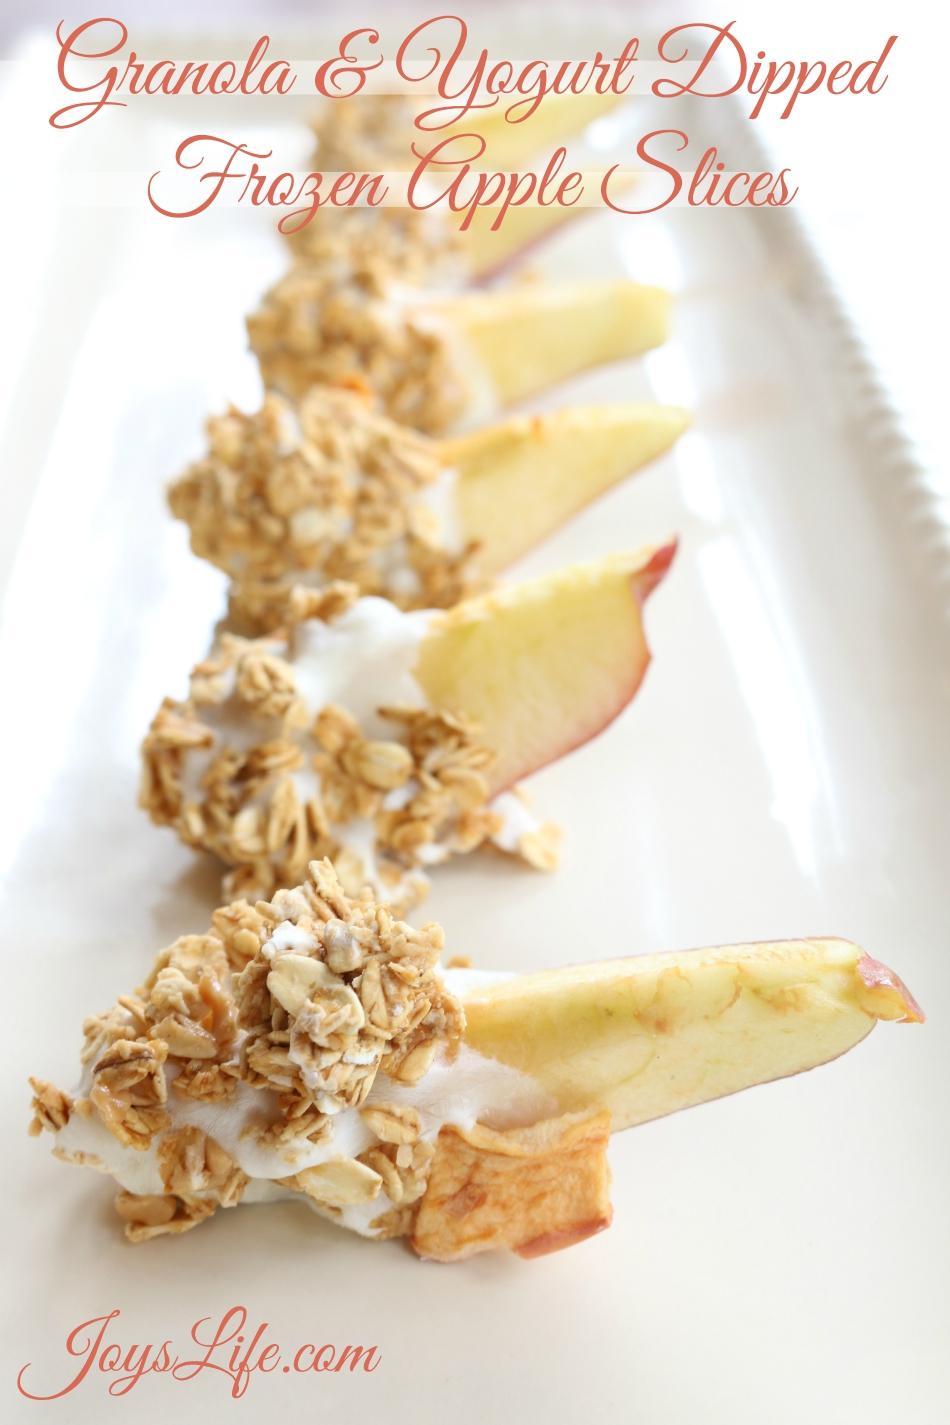 Granola & Yogurt Dipped Frozen Apple Slices #FueledByGranola #Ad